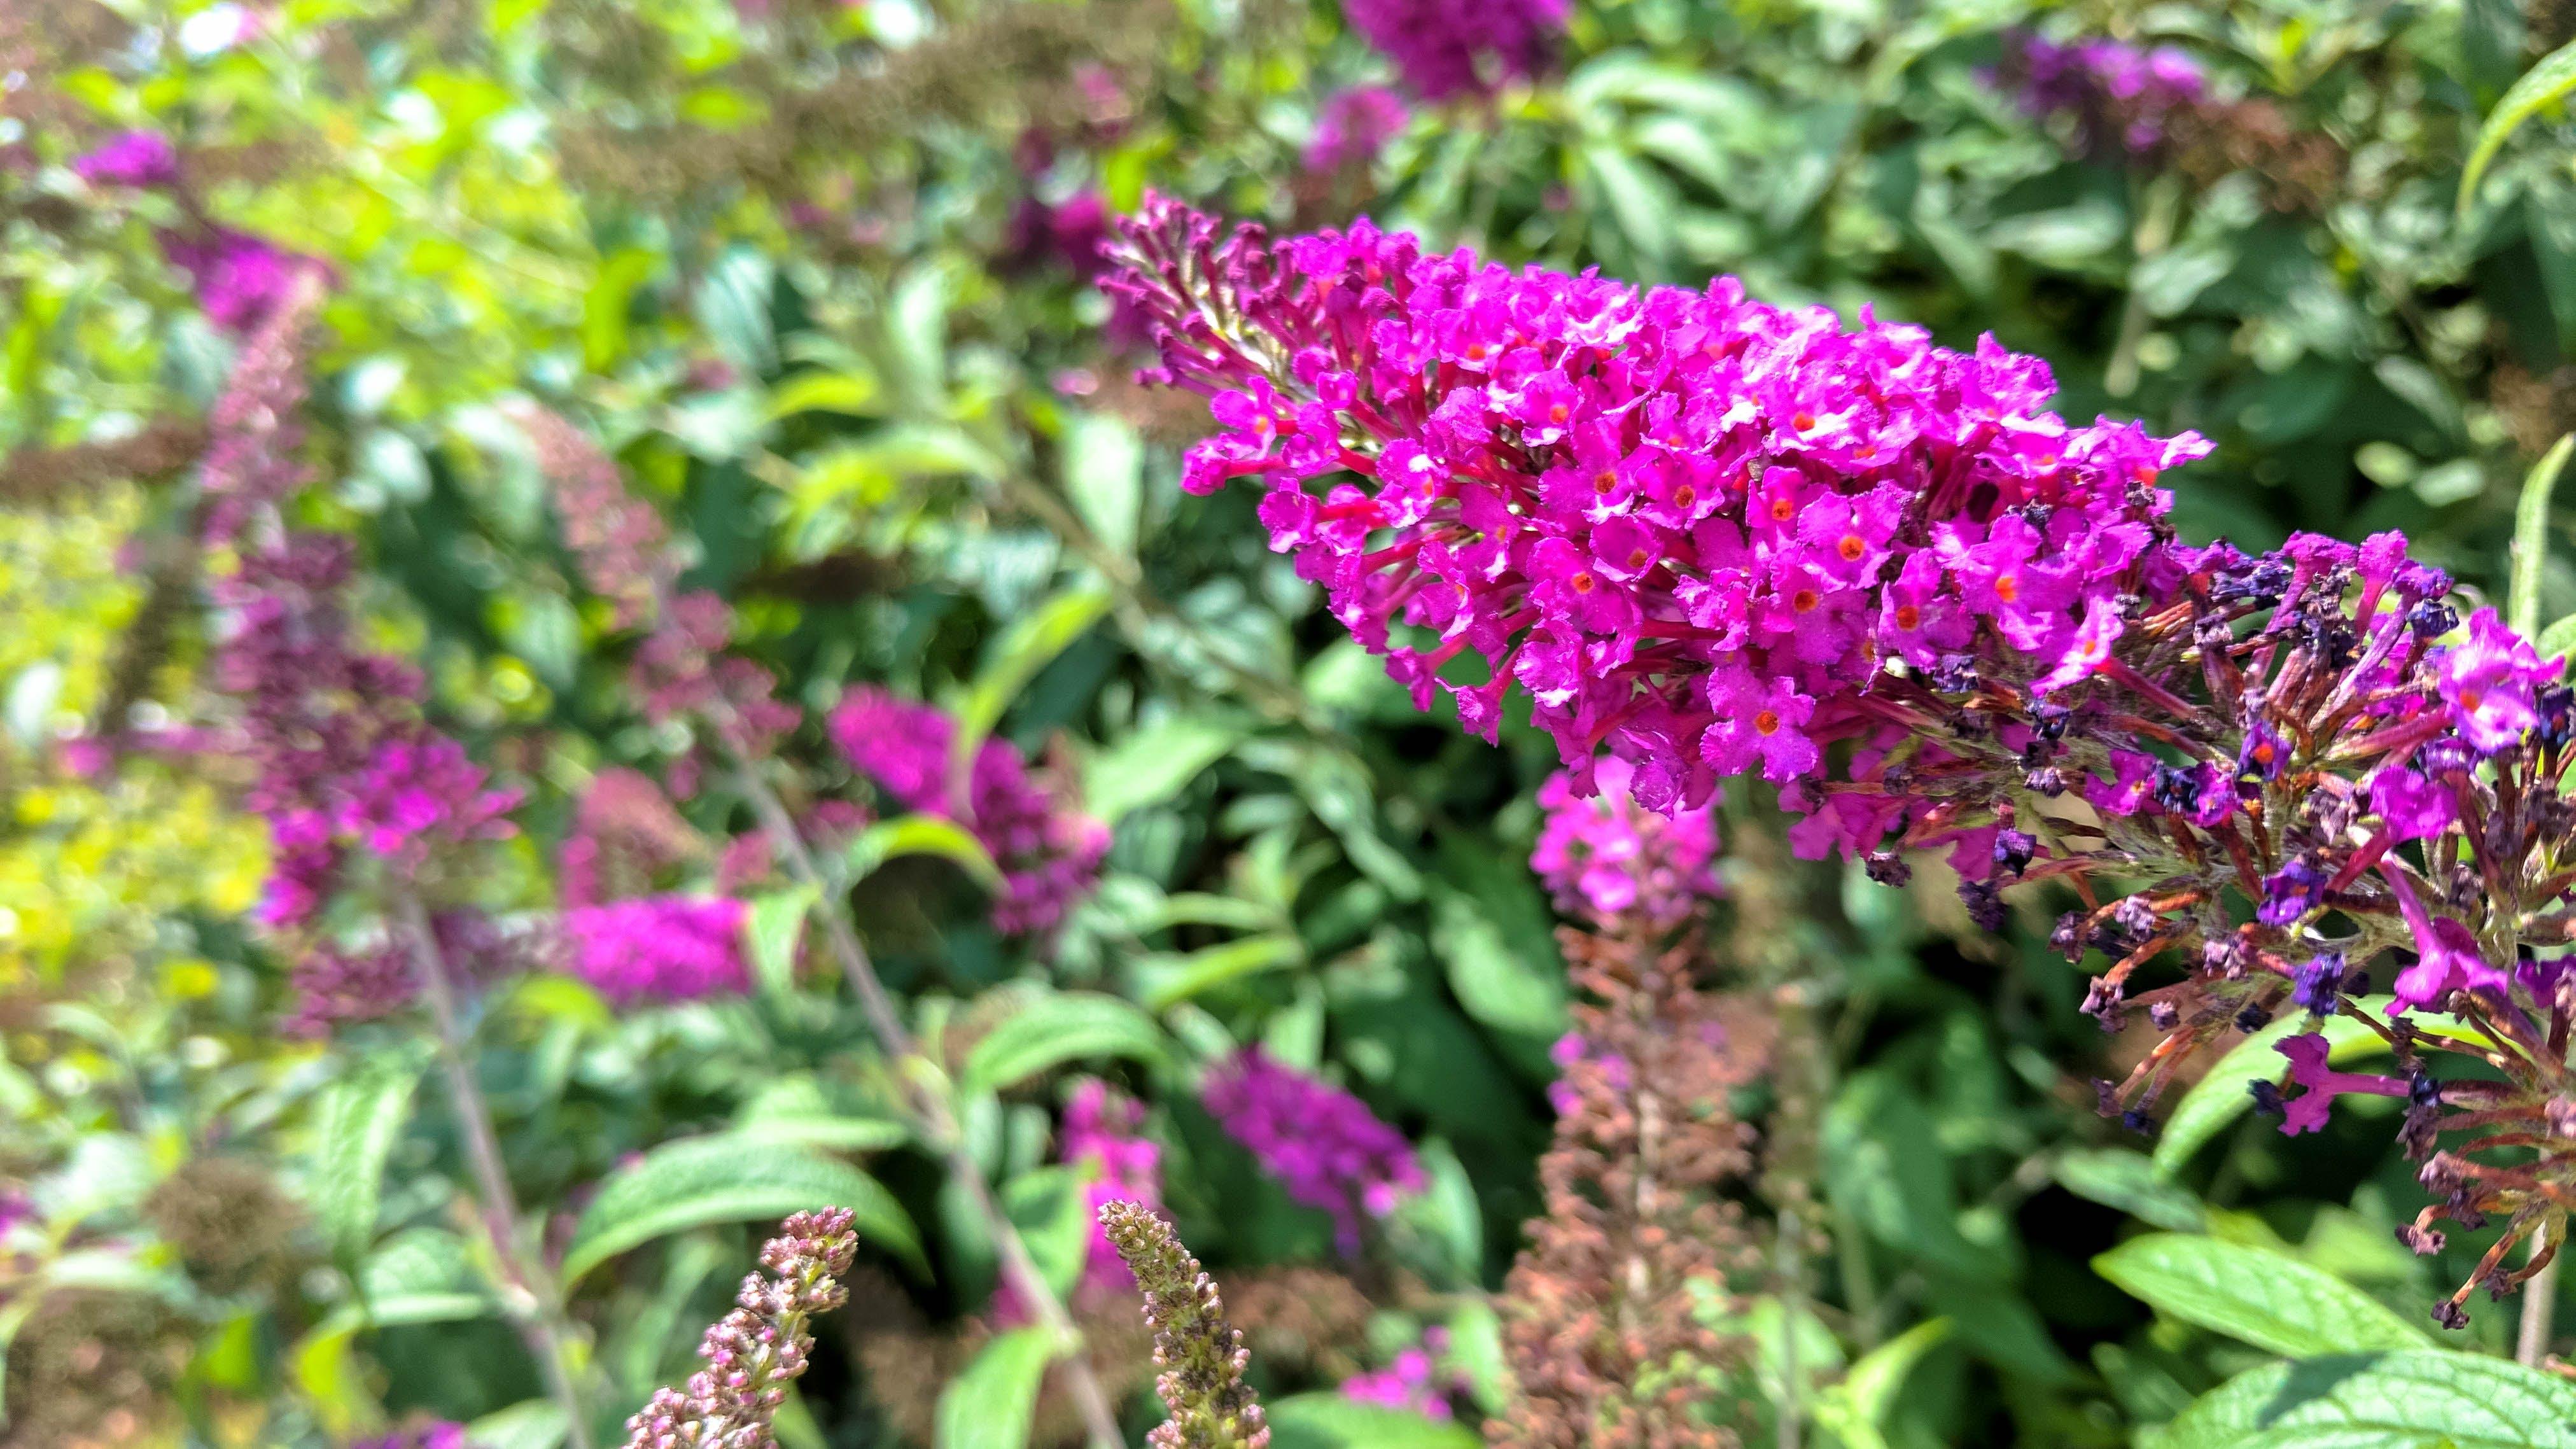 Free stock photo of beautiful flowers, flower, flowers, pink flowers